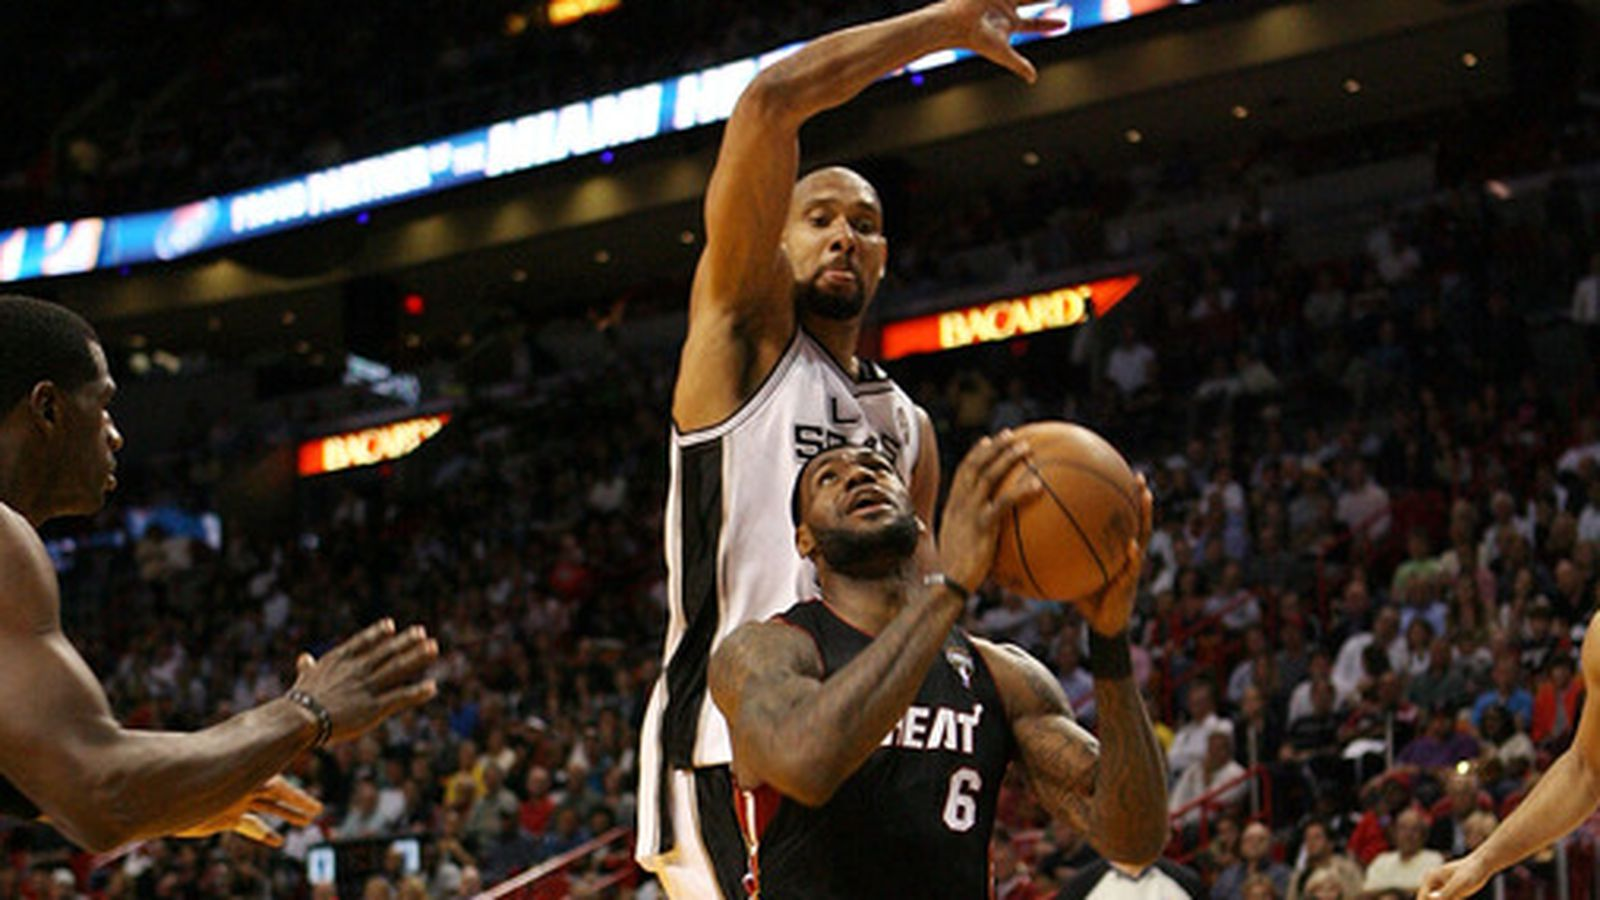 2013 NBA Finals: An OKC Thunder expert's perspective on Spurs vs Heat - Pounding The Rock